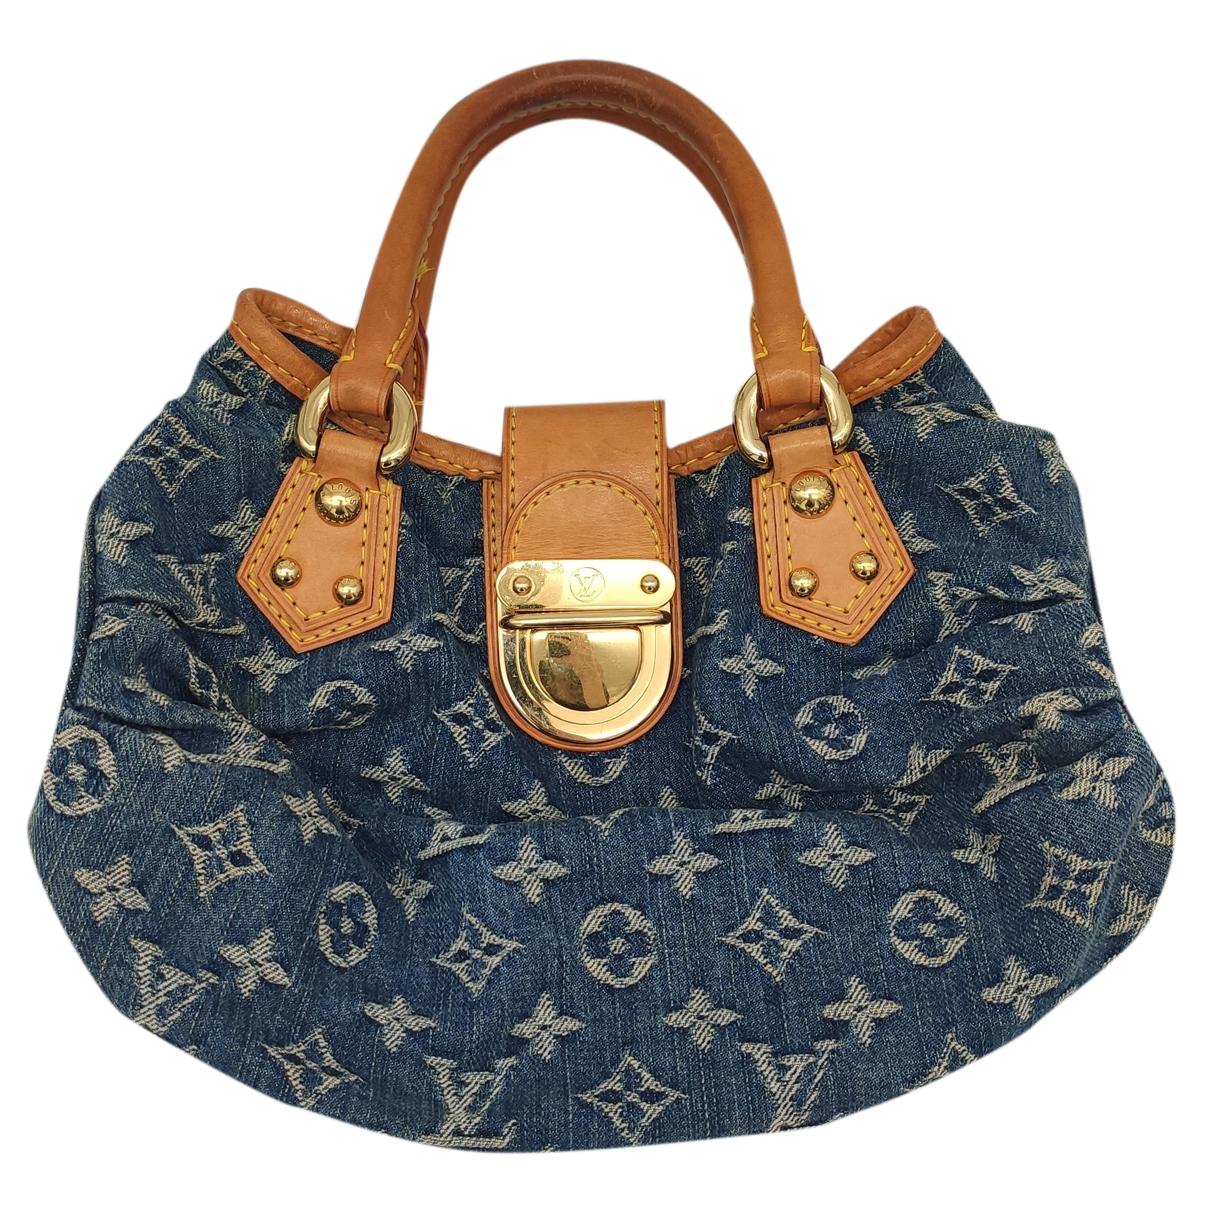 Louis Vuitton Baggy Handtasche in  Blau Denim - Jeans